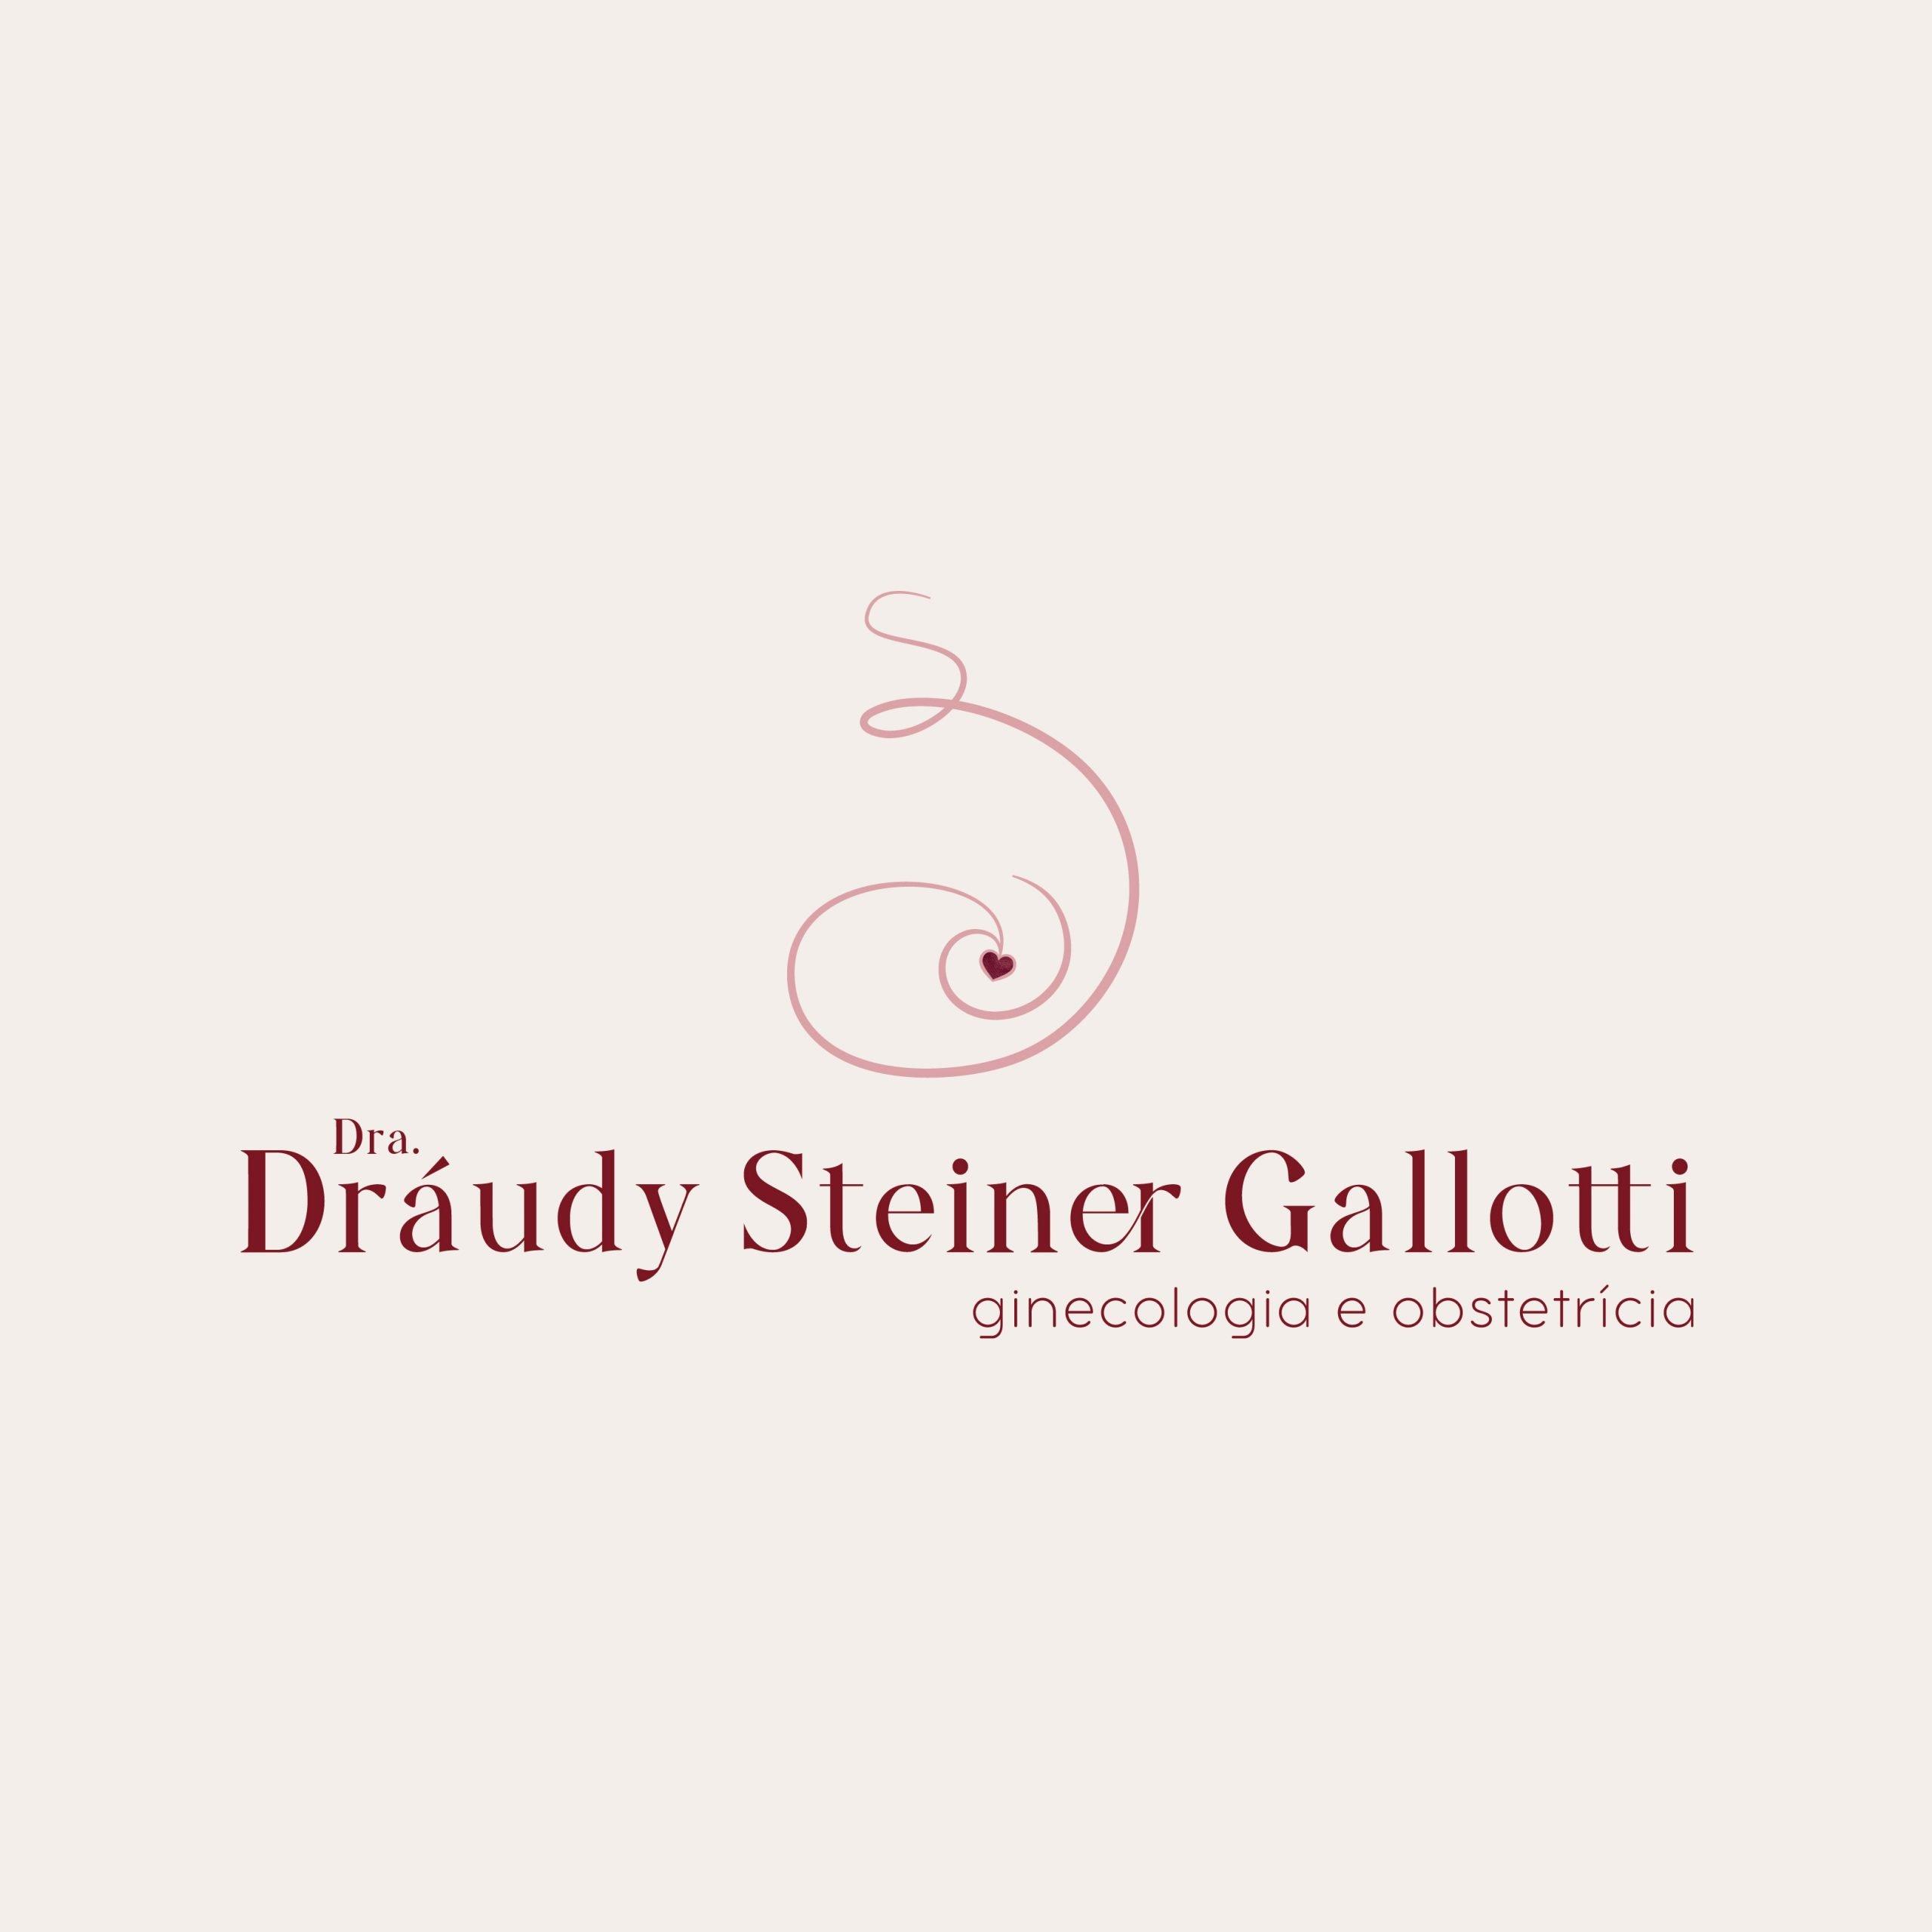 Identidade Visual Empresarial - Dráudy Steiner